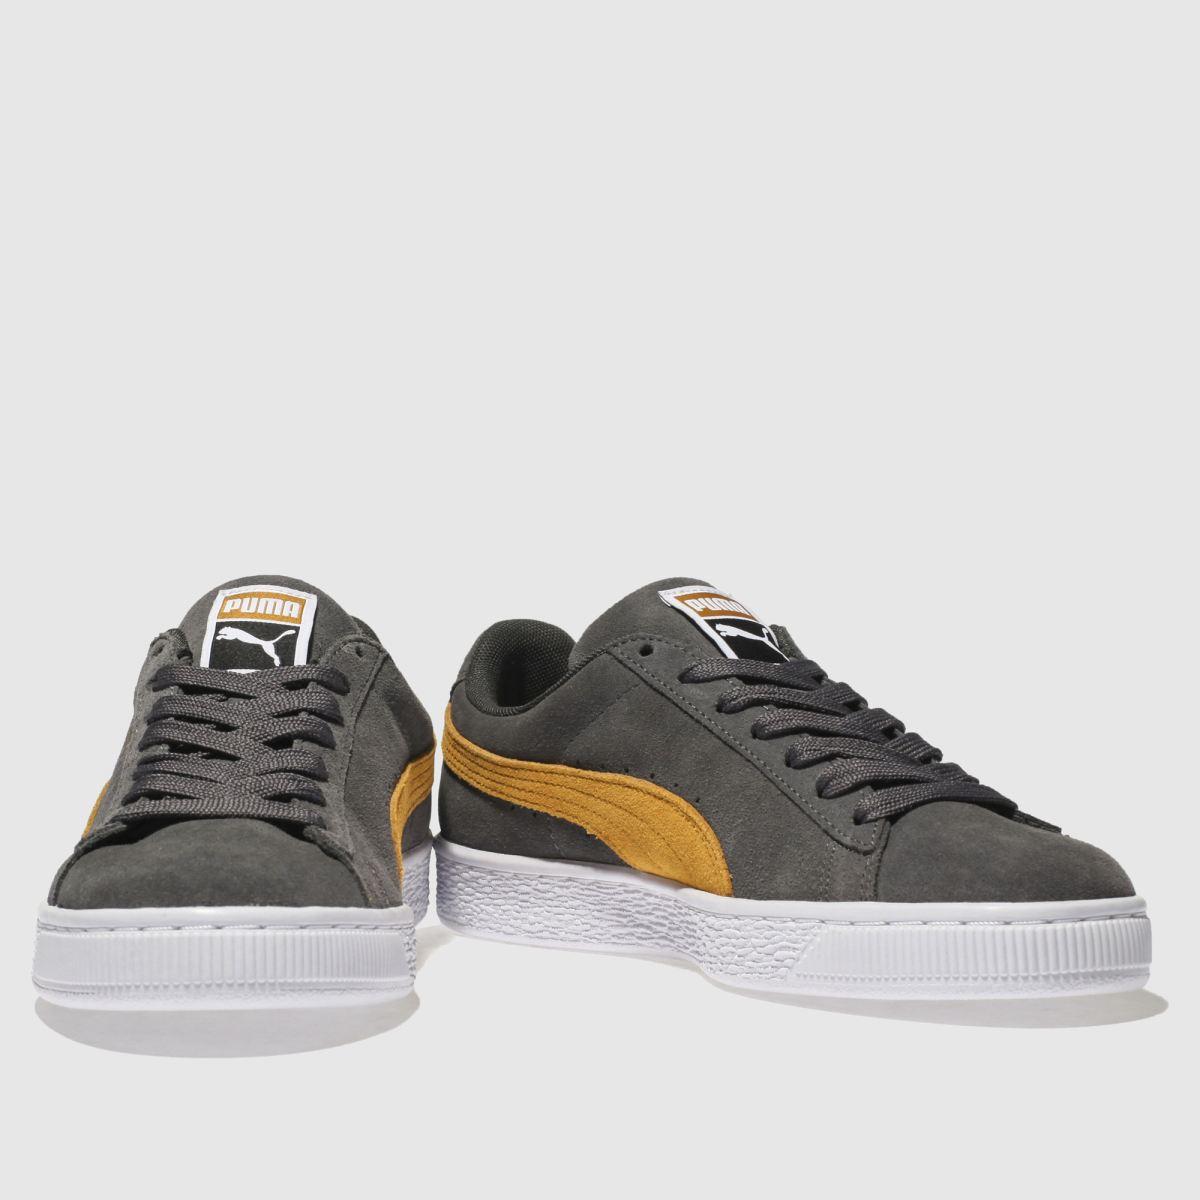 Herren Dunkelgrau puma Suede Classic Sneaker | schuh Gute Qualität beliebte Schuhe